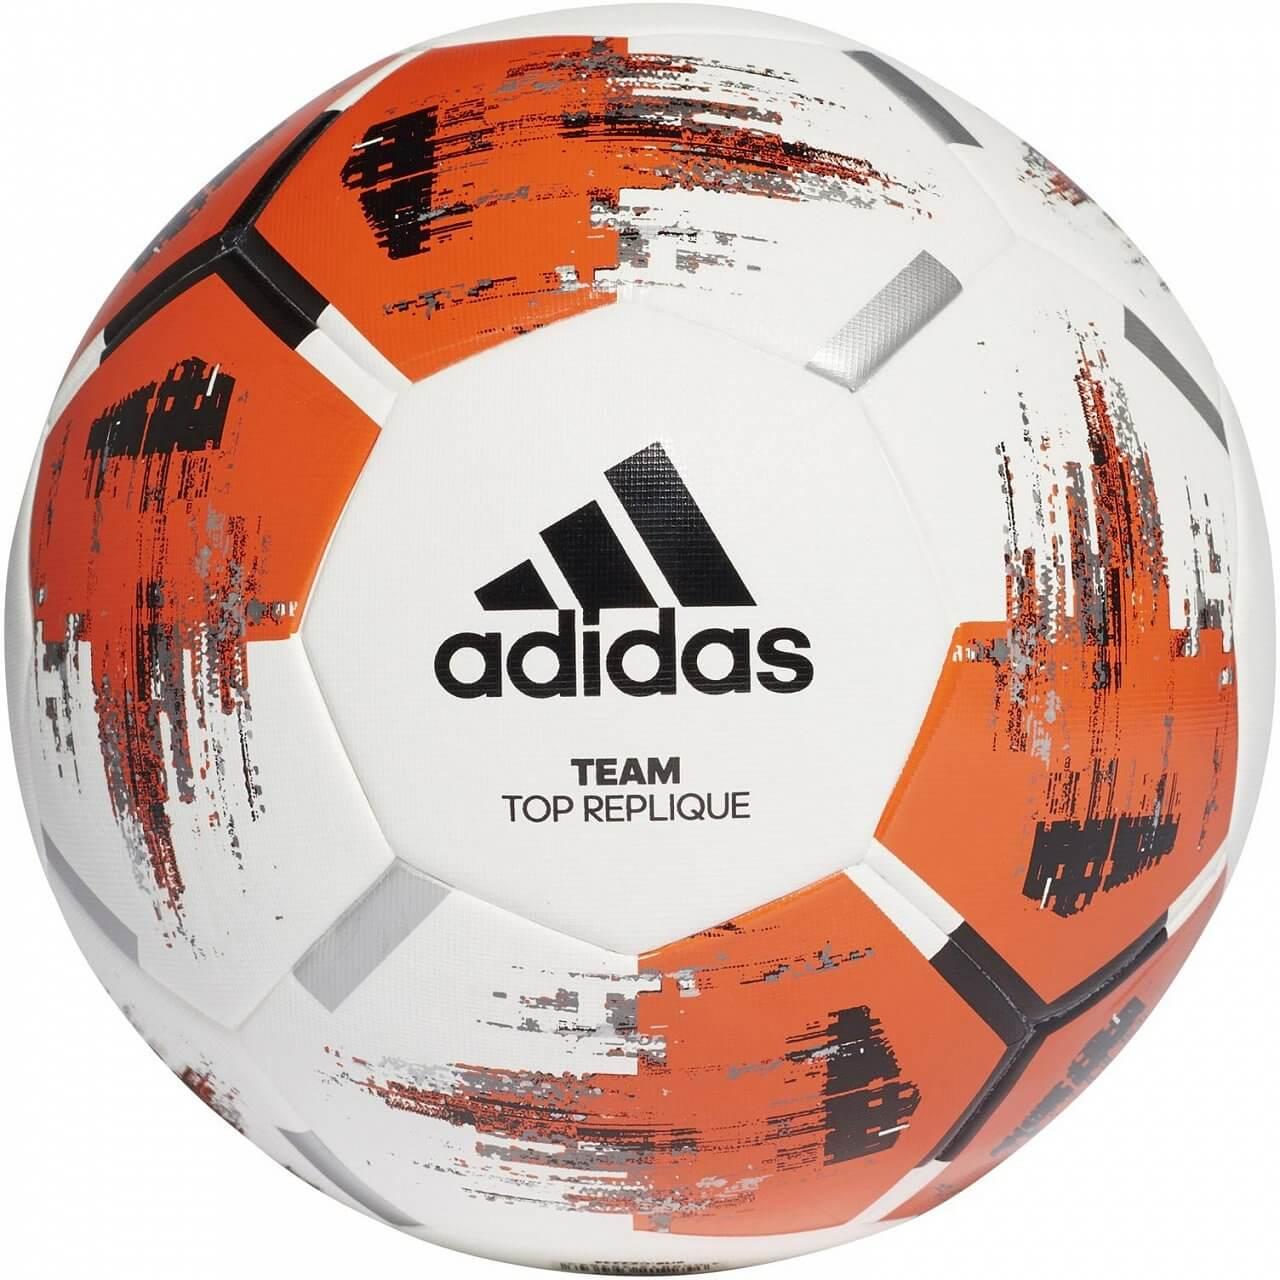 Fotbalový míč adidas TEAM TopRepliqu